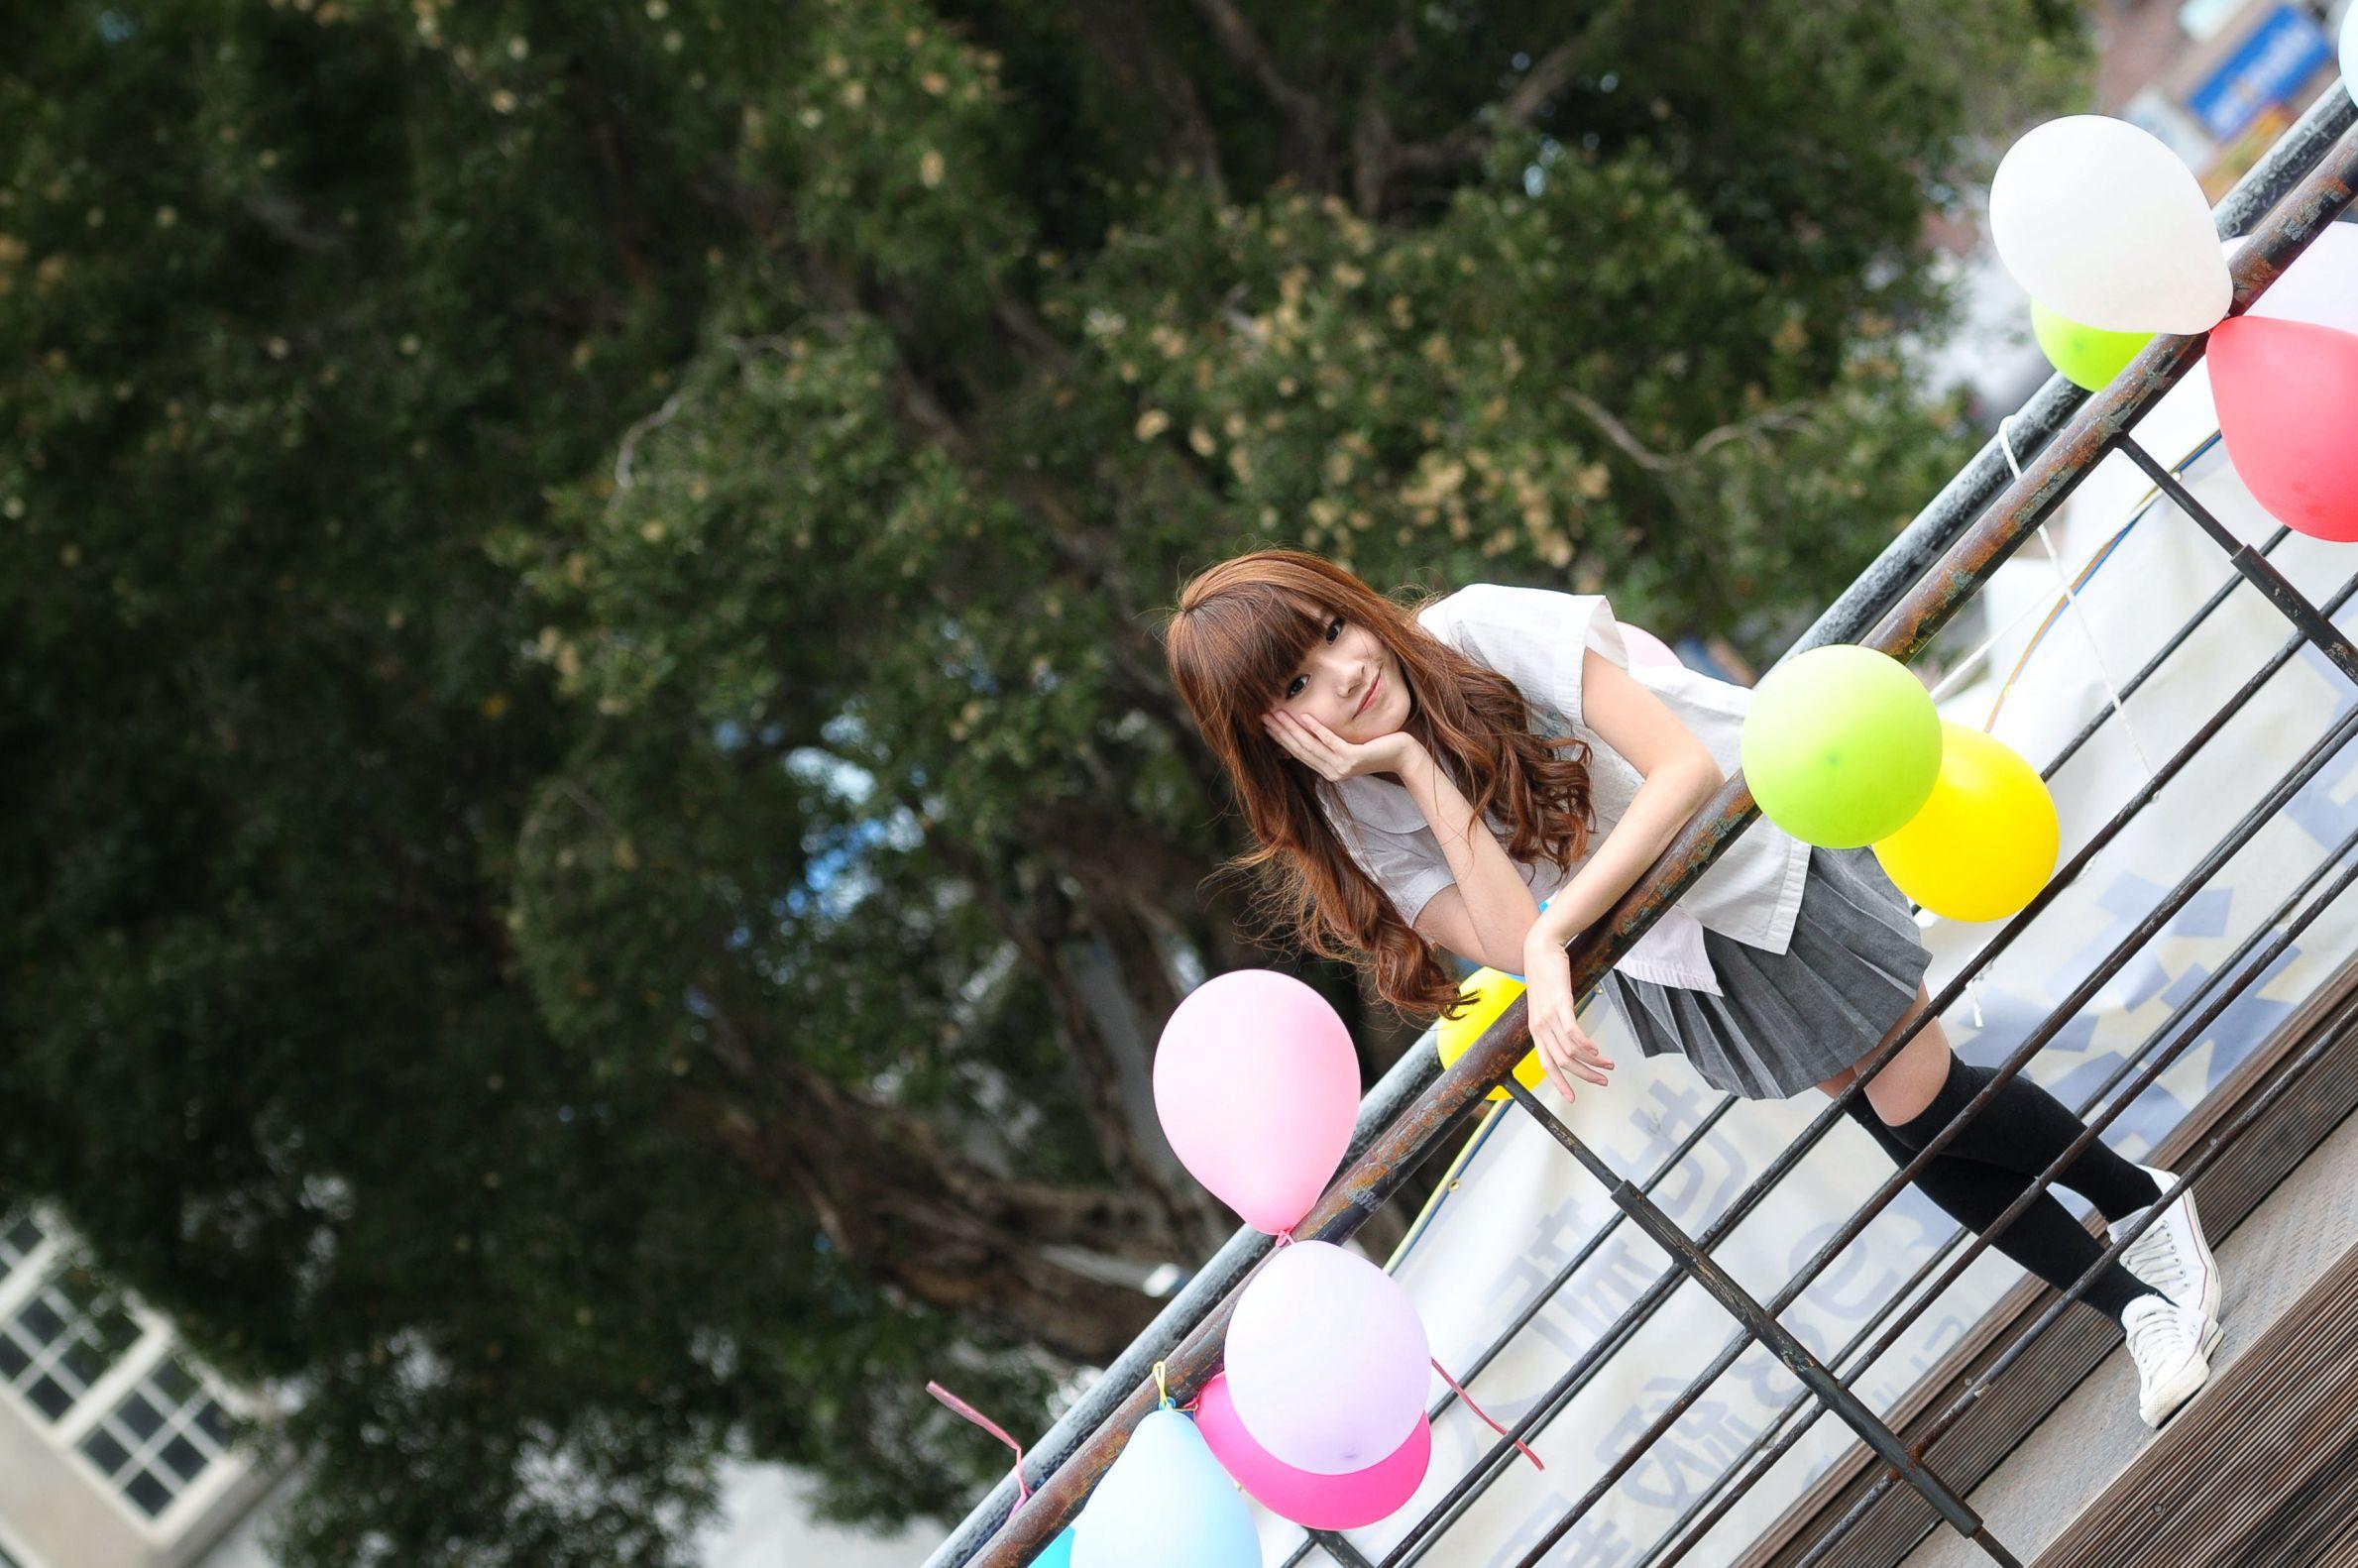 VOL.284 [台湾正妹]长筒袜校服美少女妹子:卢昕妤(艾瑞丝,腿模Aries)高品质写真套图(26P)